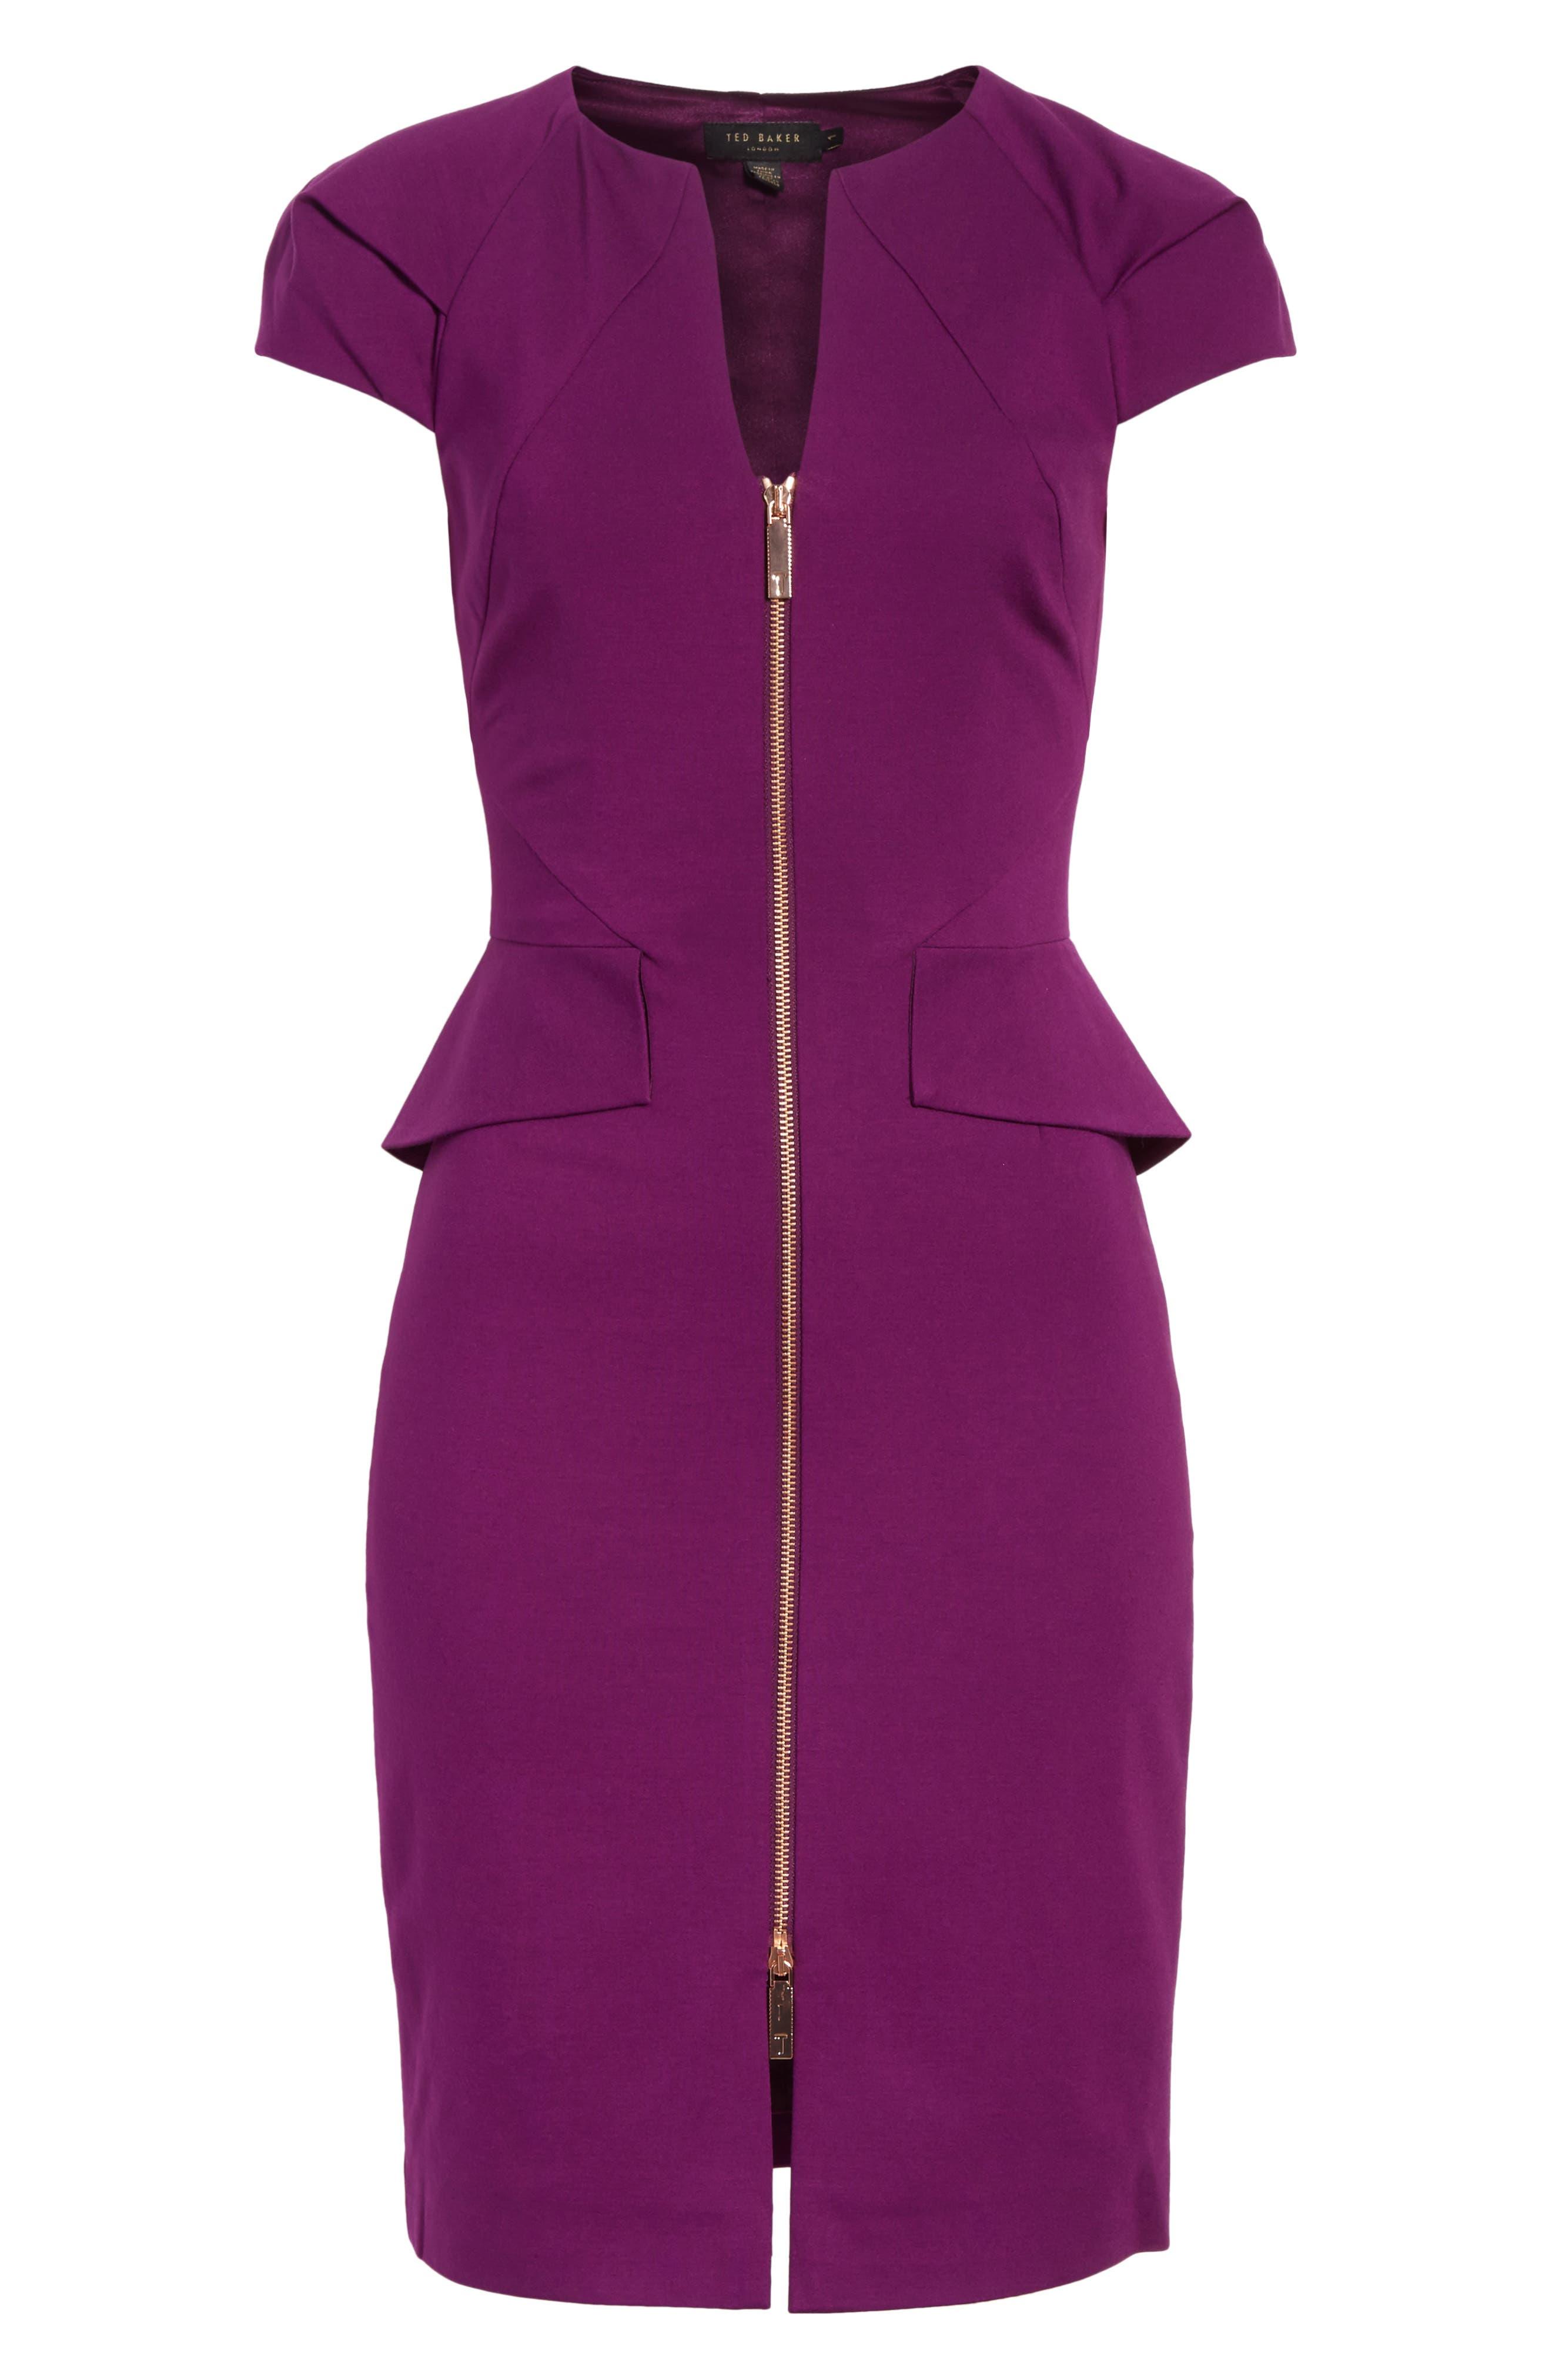 Fidelle Structured Peplum Dress,                             Alternate thumbnail 6, color,                             501